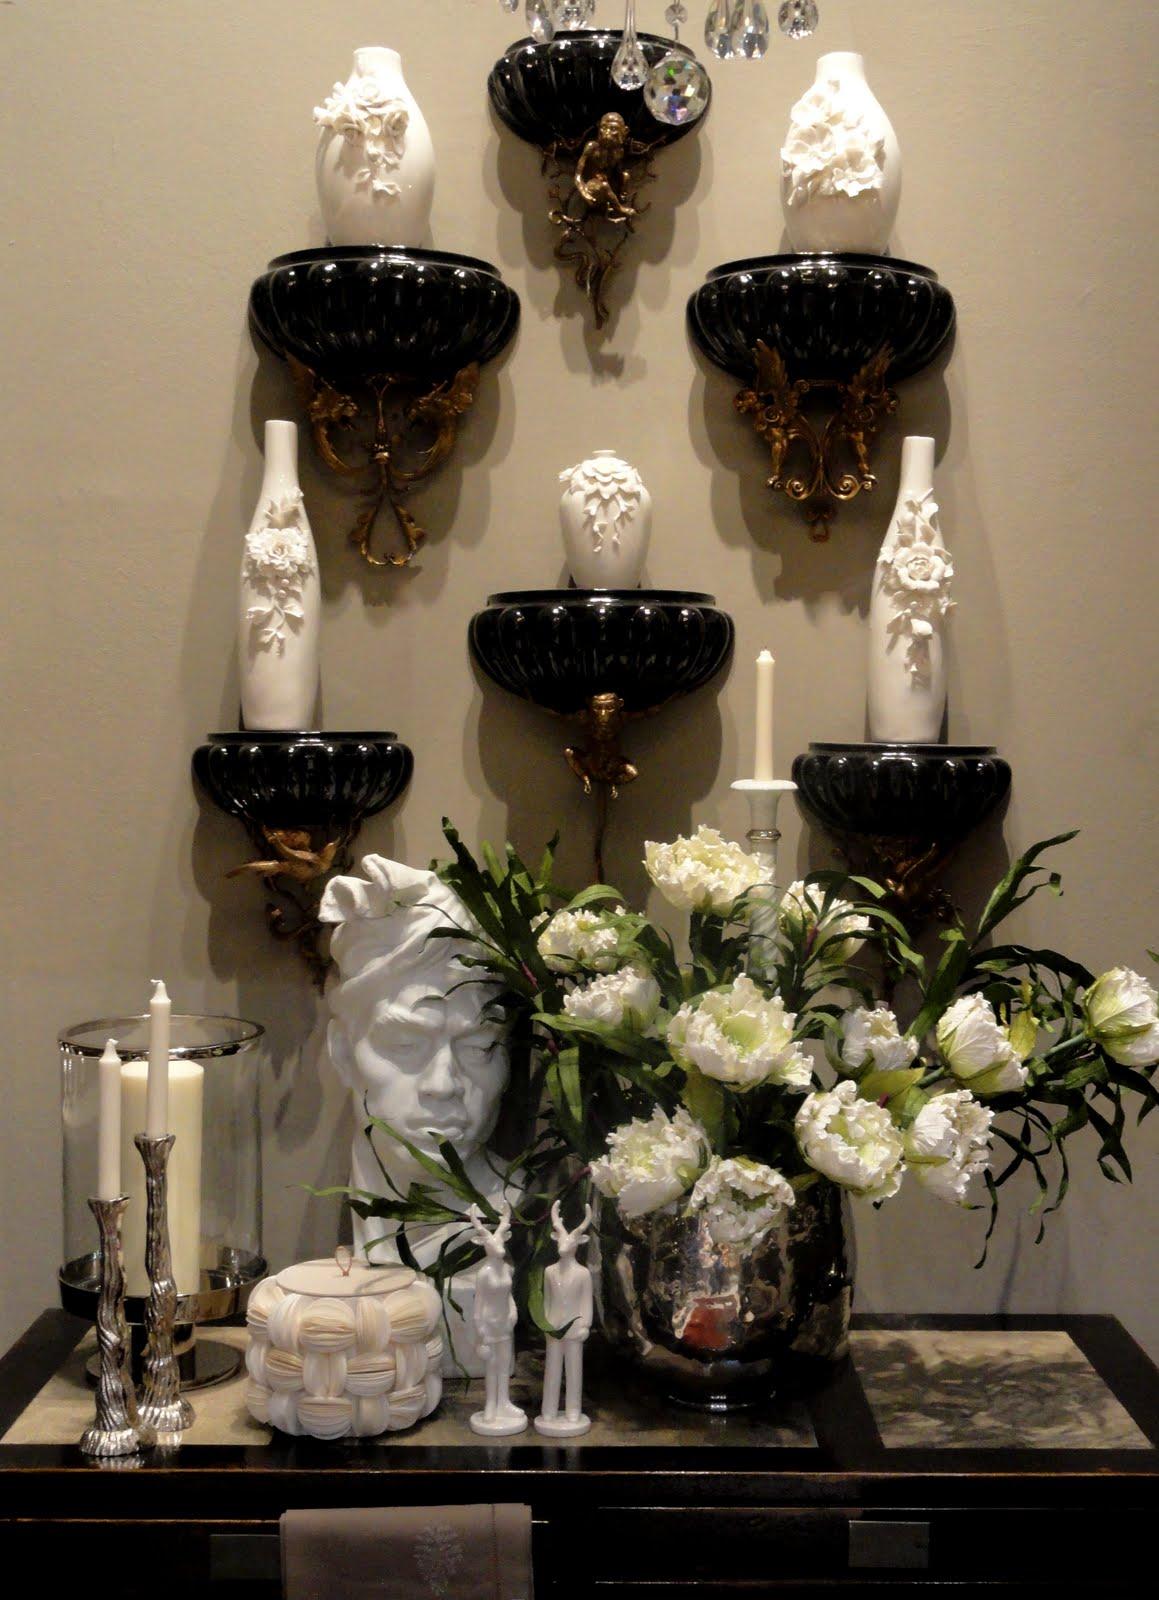 jean dange new wall brackets in porcelain bronze nouvelle collection de consoles murales en. Black Bedroom Furniture Sets. Home Design Ideas